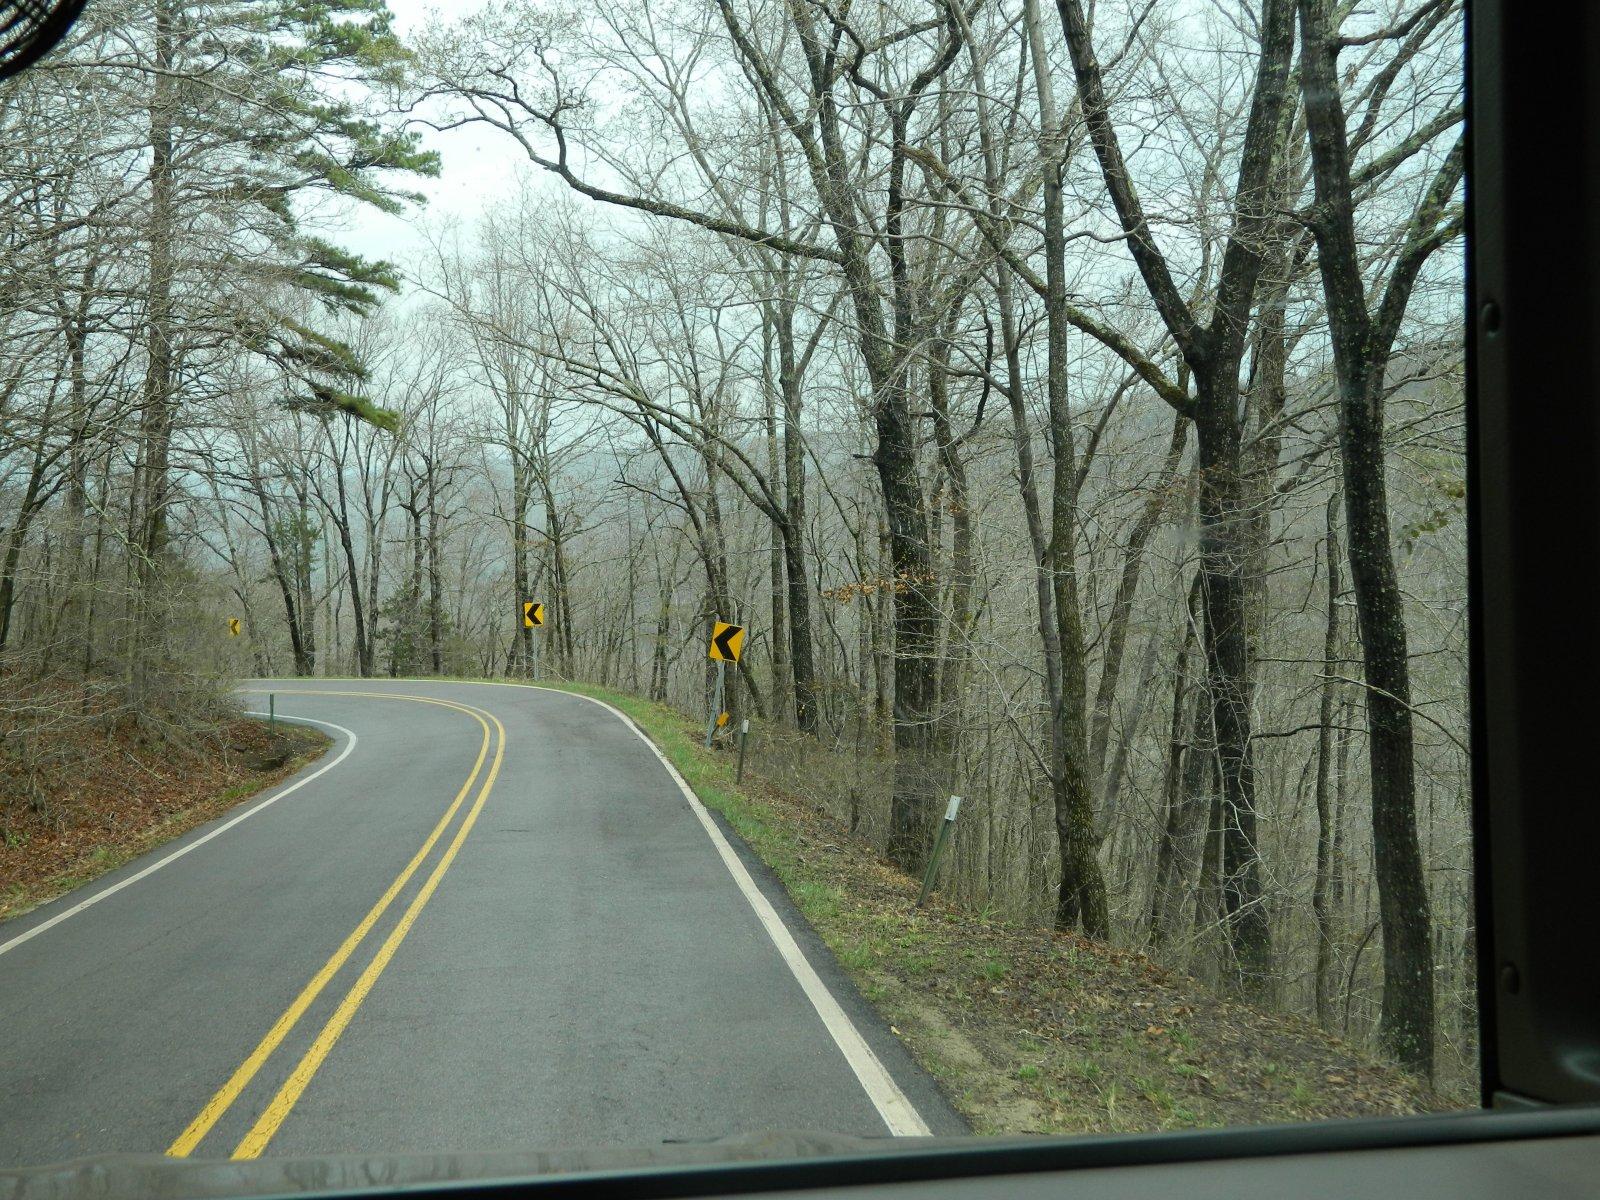 Click image for larger version  Name:Arkansas Trip 2014 290.jpg Views:117 Size:583.7 KB ID:88030